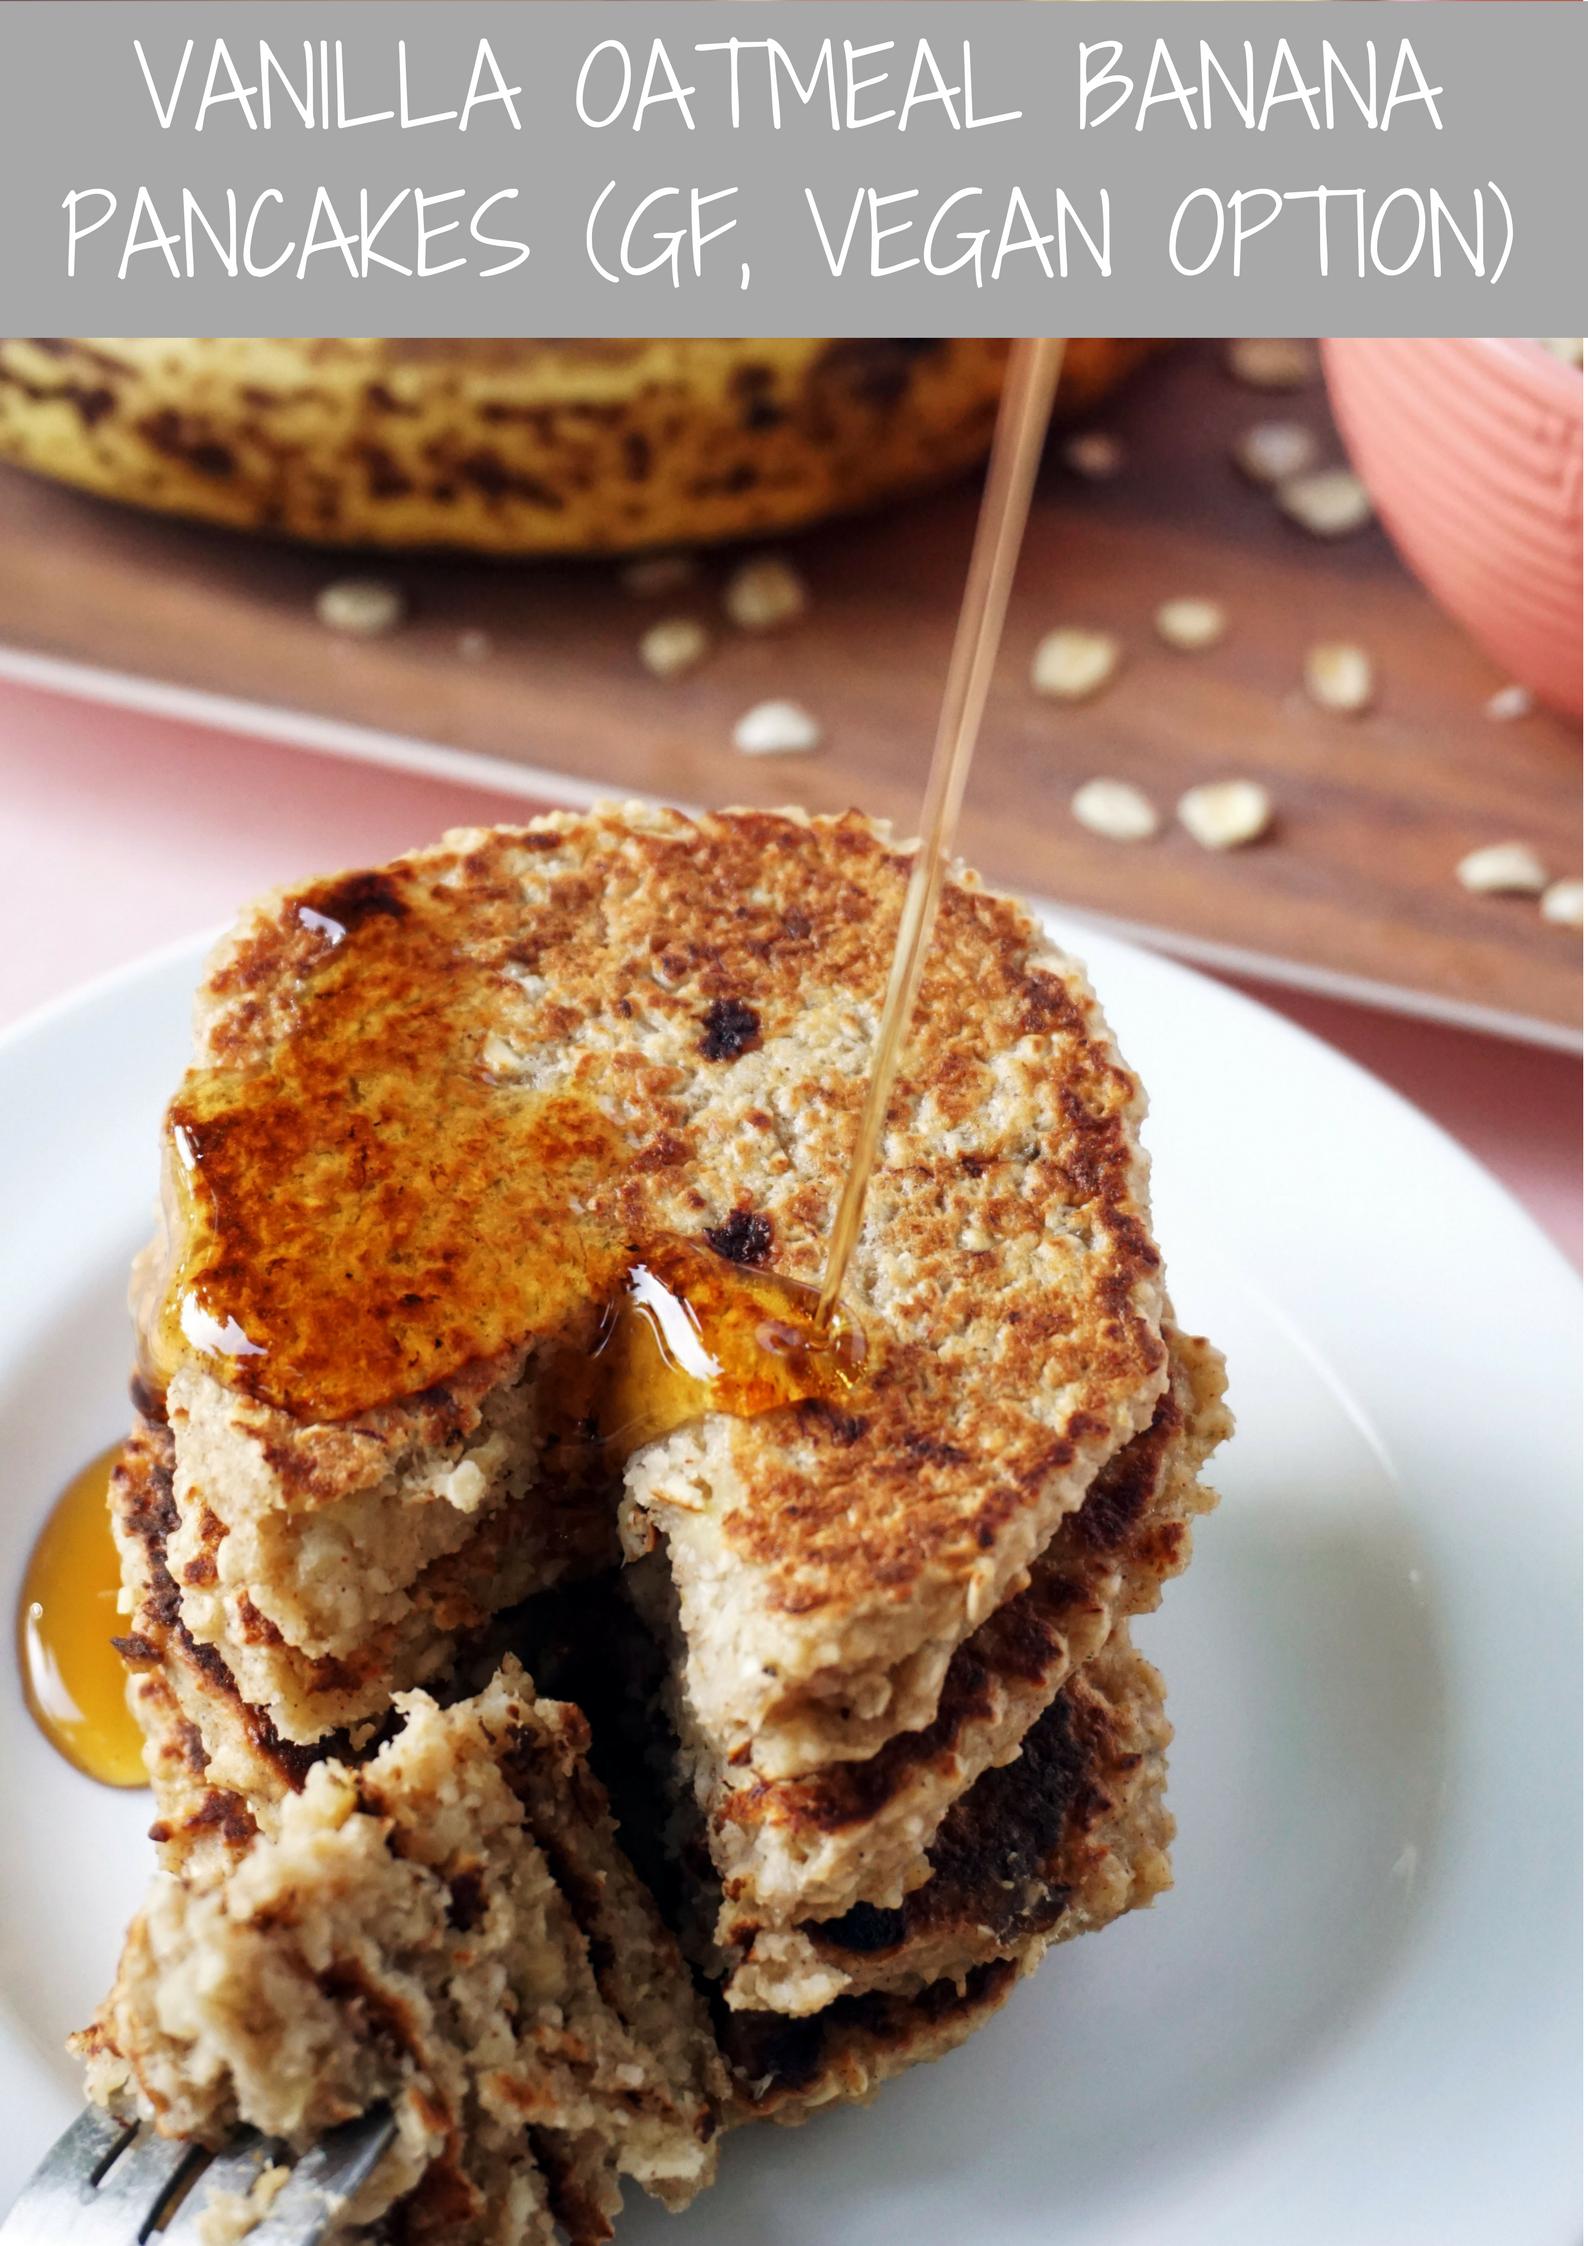 Vanilla Oatmeal Banana Pancakes (GF, Vegan option)